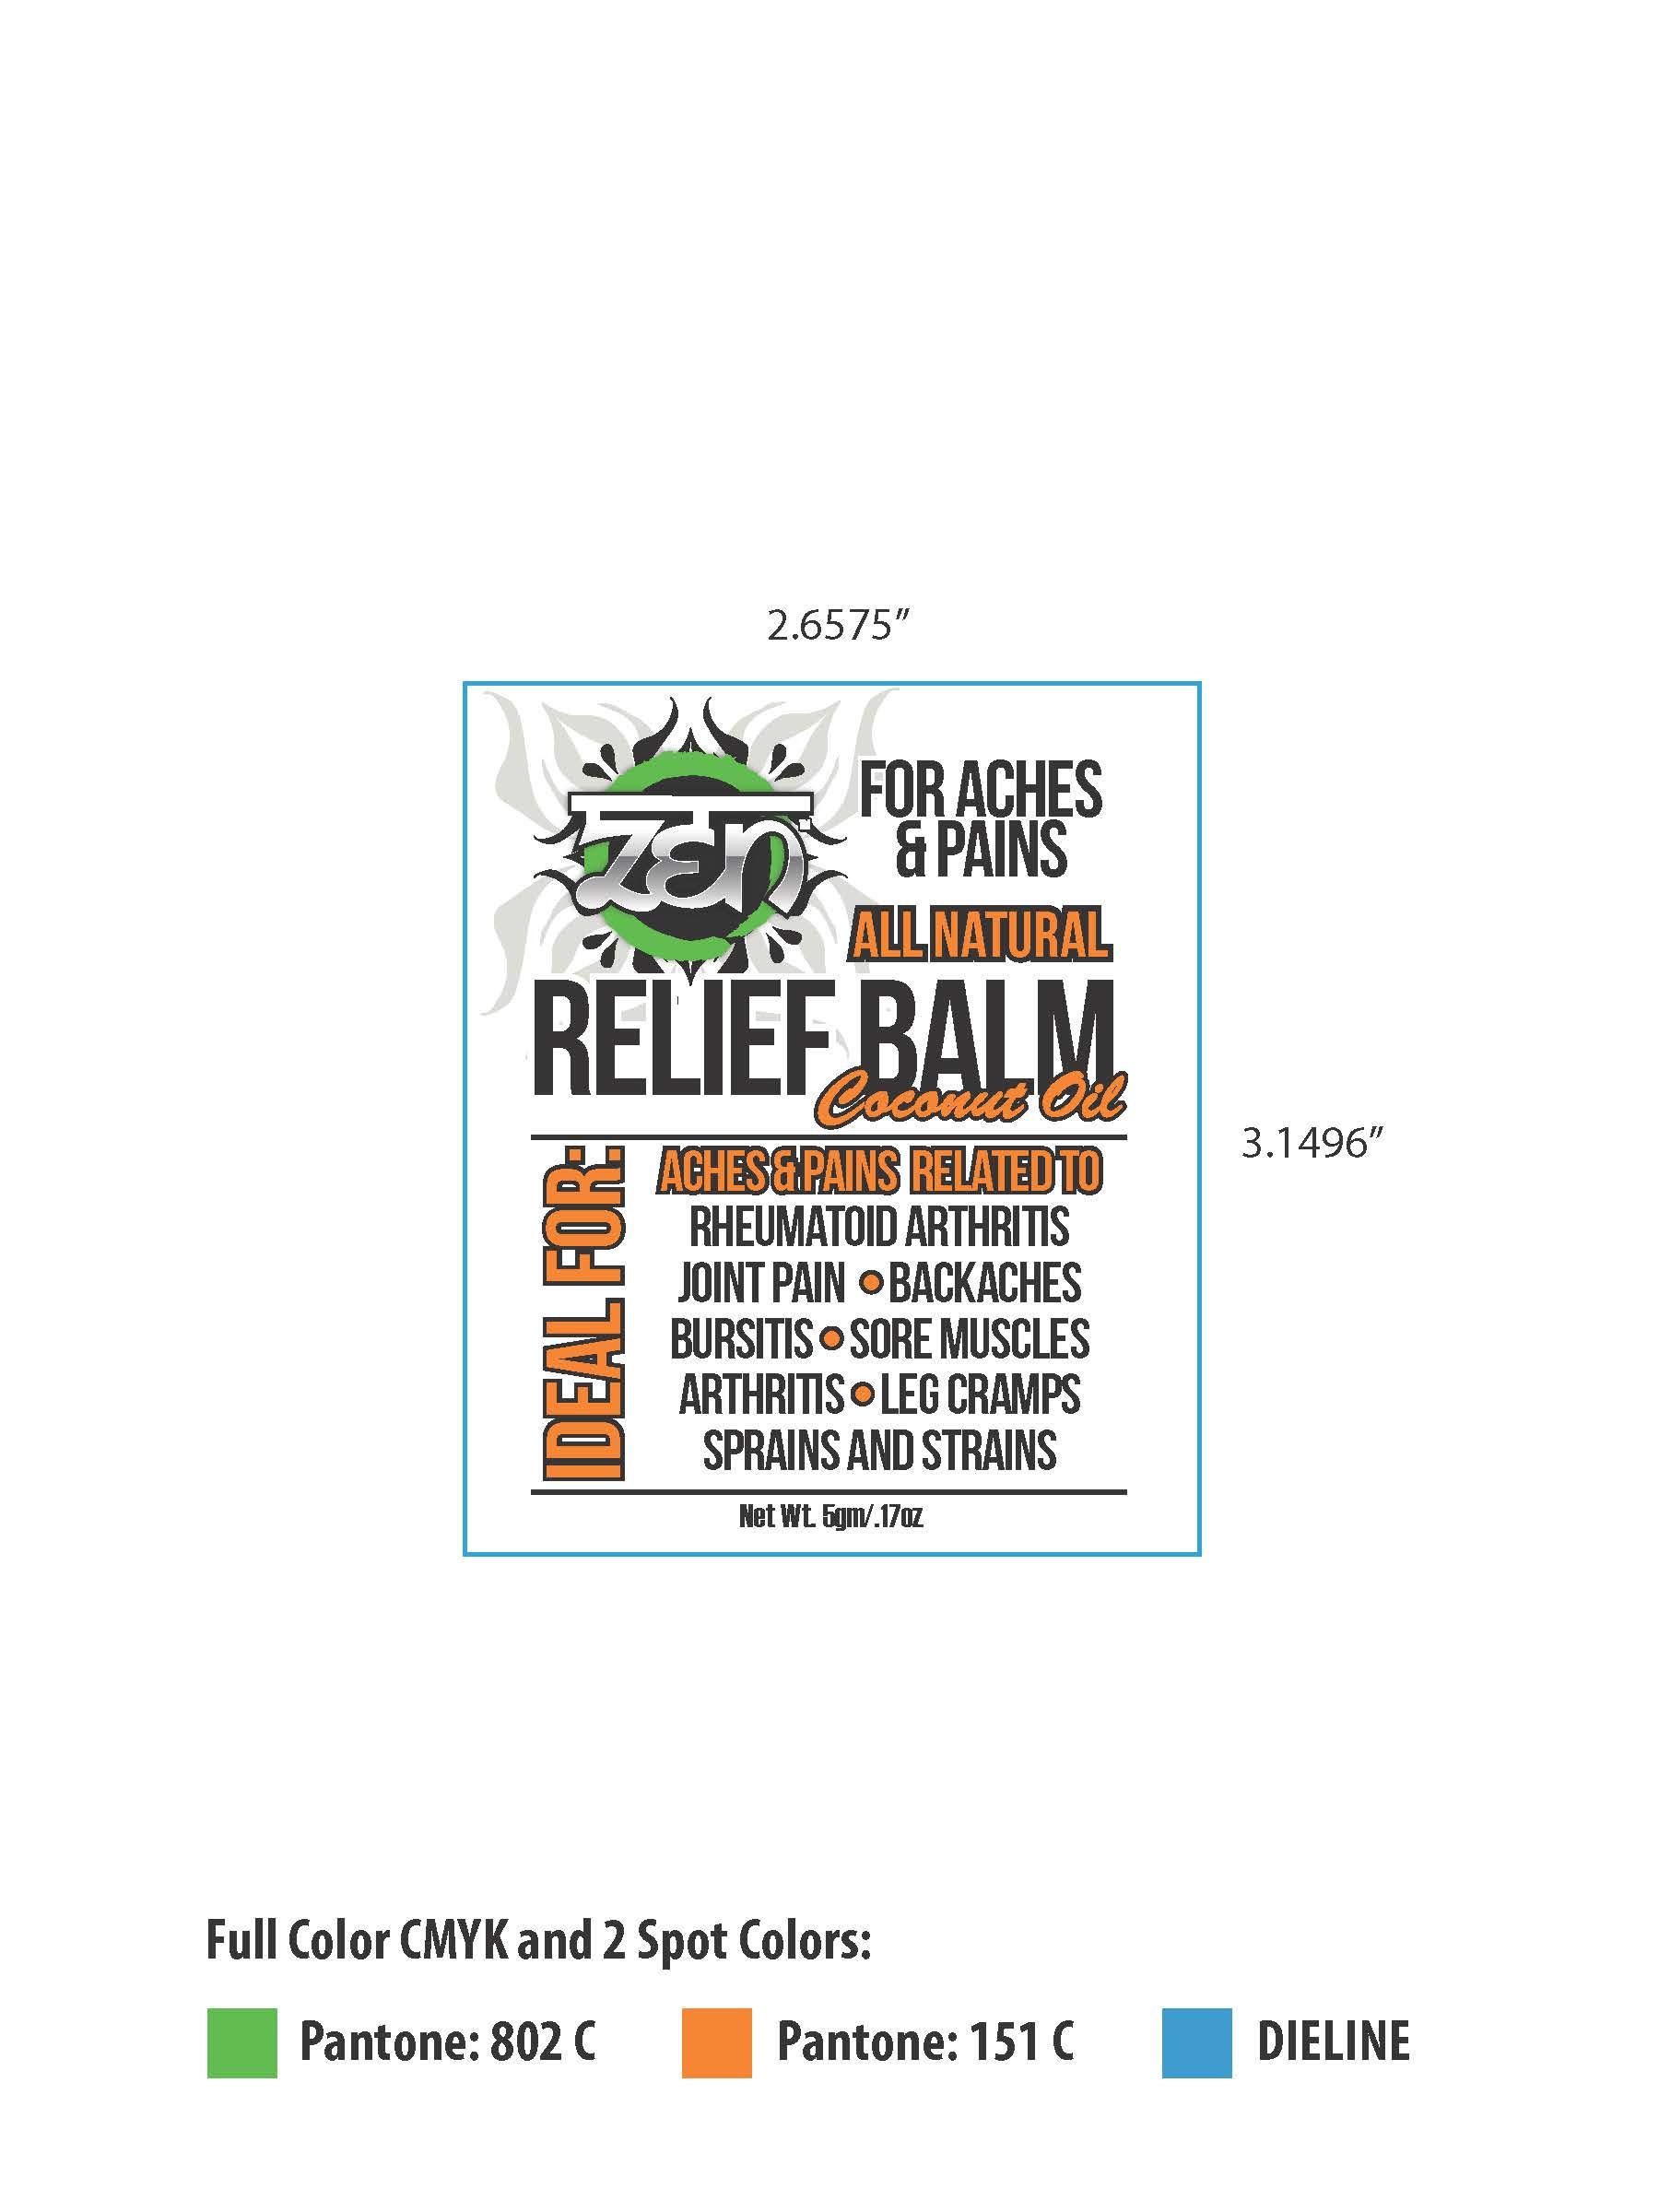 camphor, eucalyptus oil, menthol, methyl salicylate (Relief Balm)